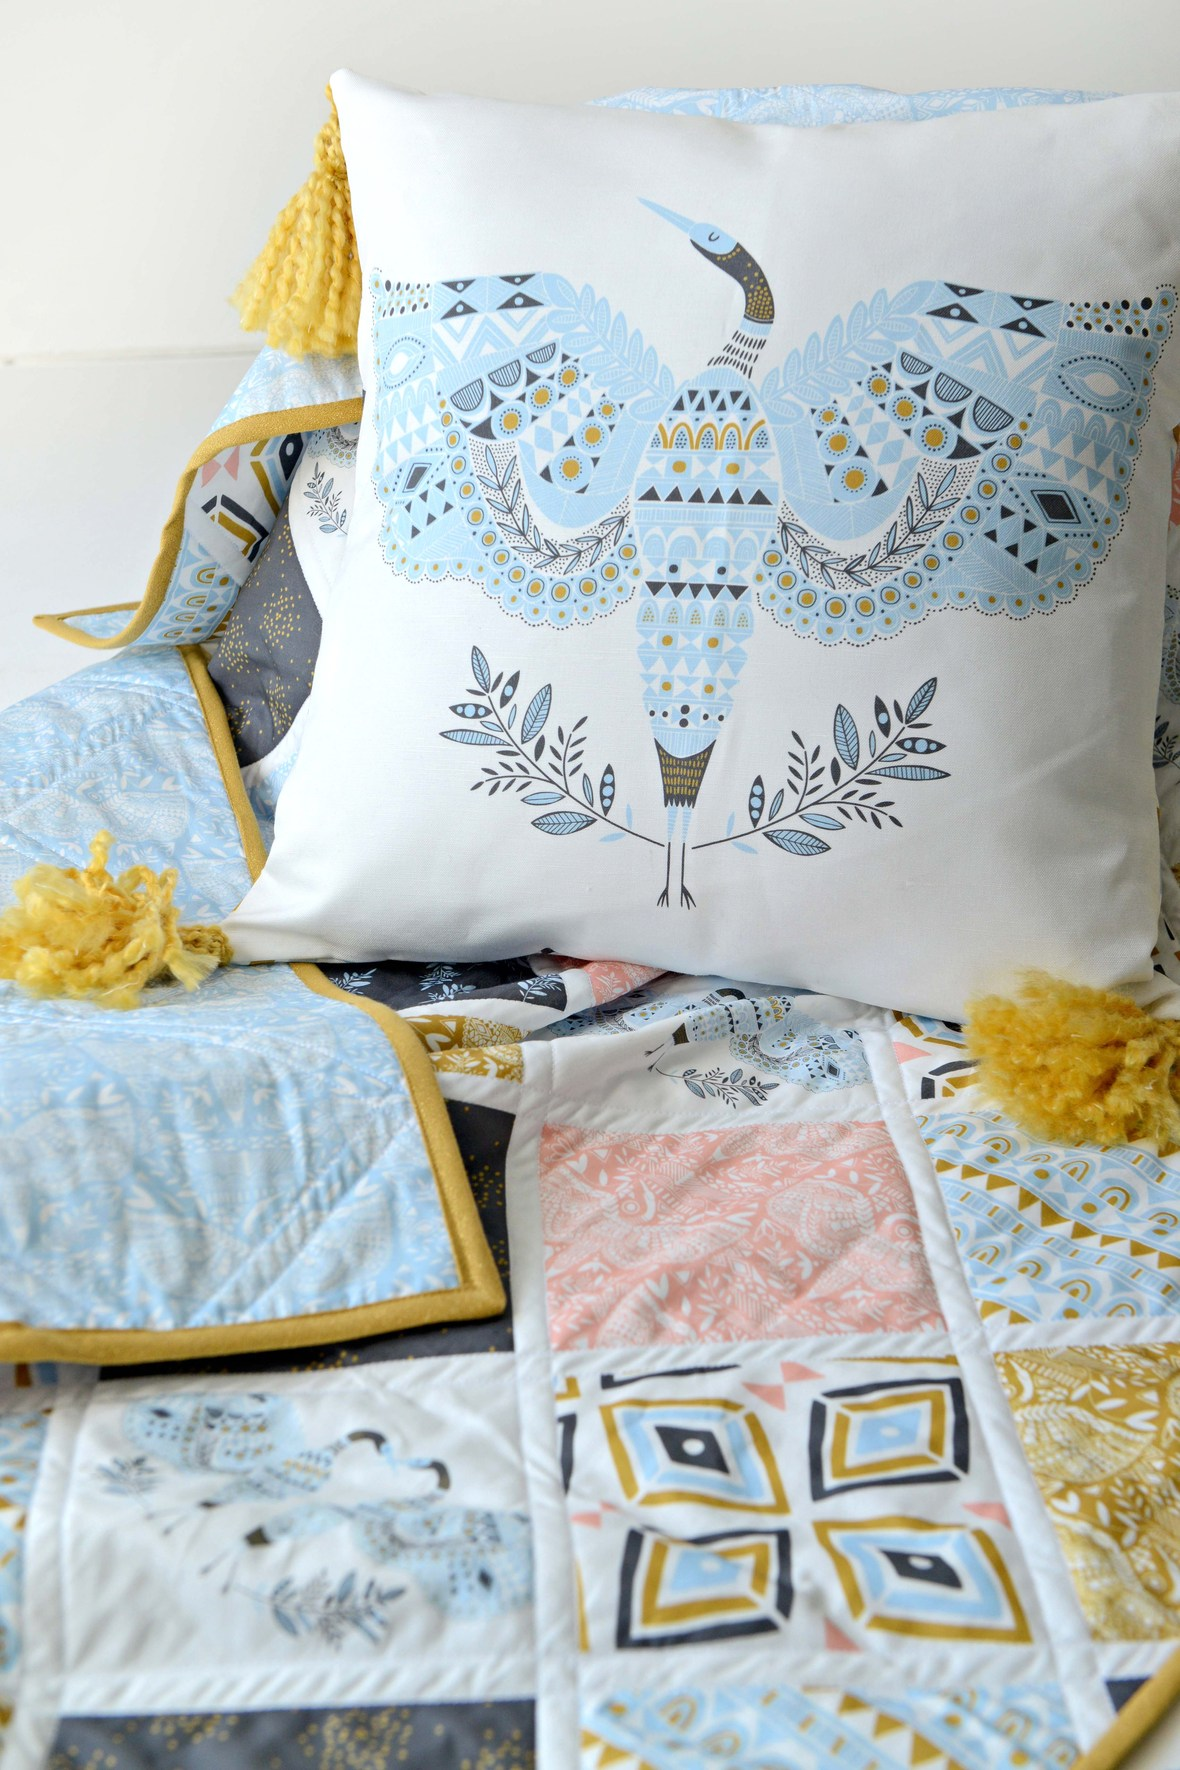 Anhinga Fabric Pillow and Quilt.jpg